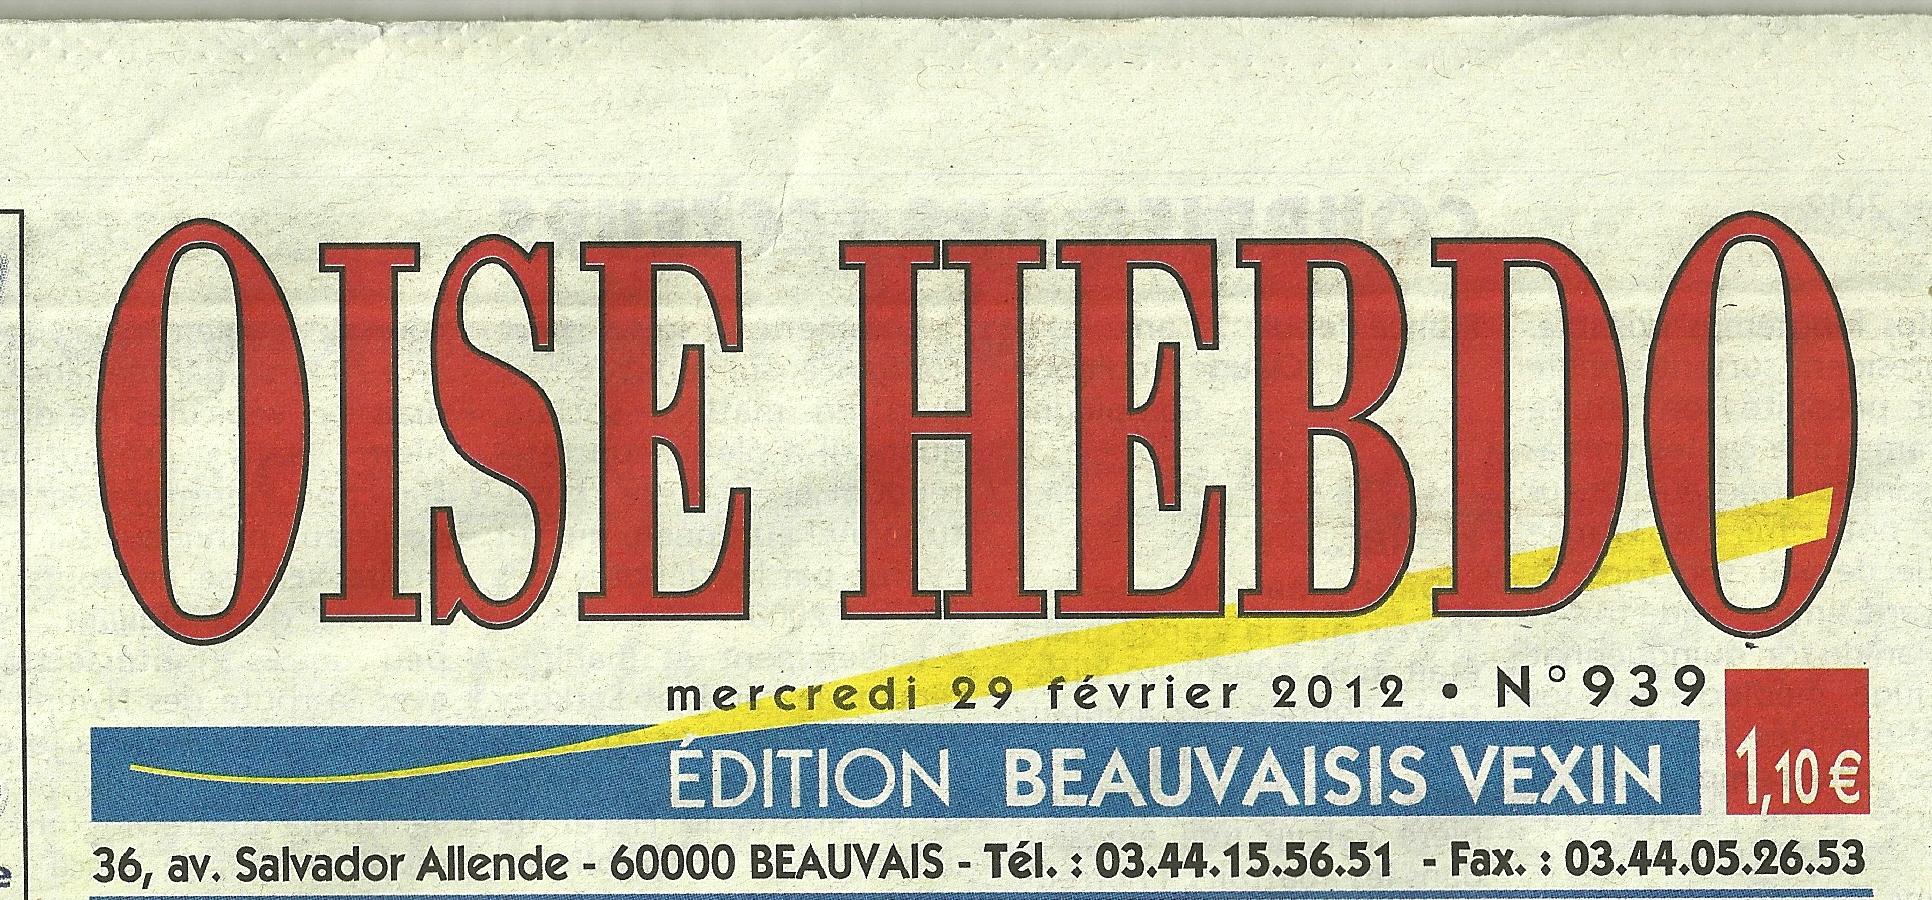 FFPA ARTICLE OISE HEBDO DU 29 02 2012